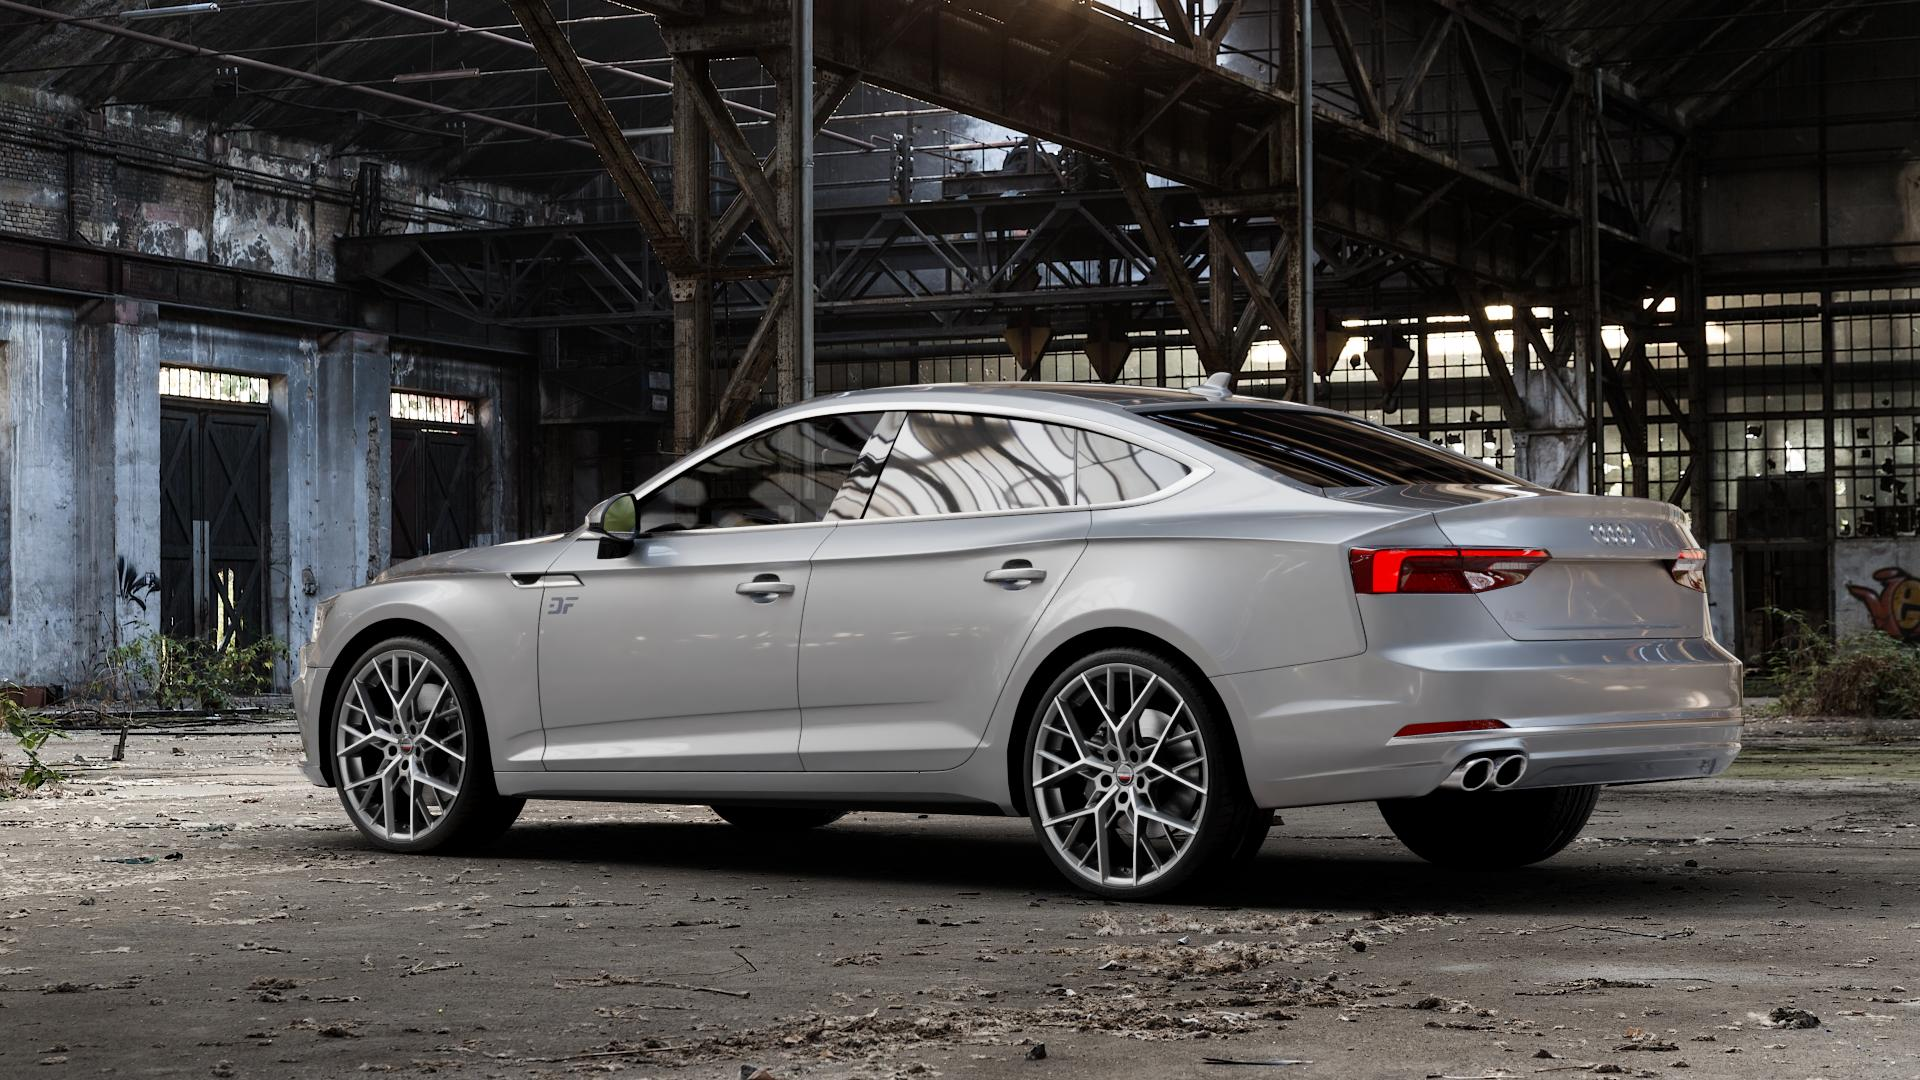 Borbet BY titan polished matt Felge mit Reifen grau in 20Zoll Alufelge auf silbernem Audi A5 Typ B9 (Sportback) 2,0l TDI 140kW (190 PS) quattro TFSI 185kW (252 3,0l 160kW (218 200kW (272 1,4l 110kW (150 183kW (249 g-tron 125kW (170 Mild-Hybrid 100kW (136 210kW (286 45 180kW (245 35 40 50 170kW (231 120kW (163 30 ⬇️ mit 15mm